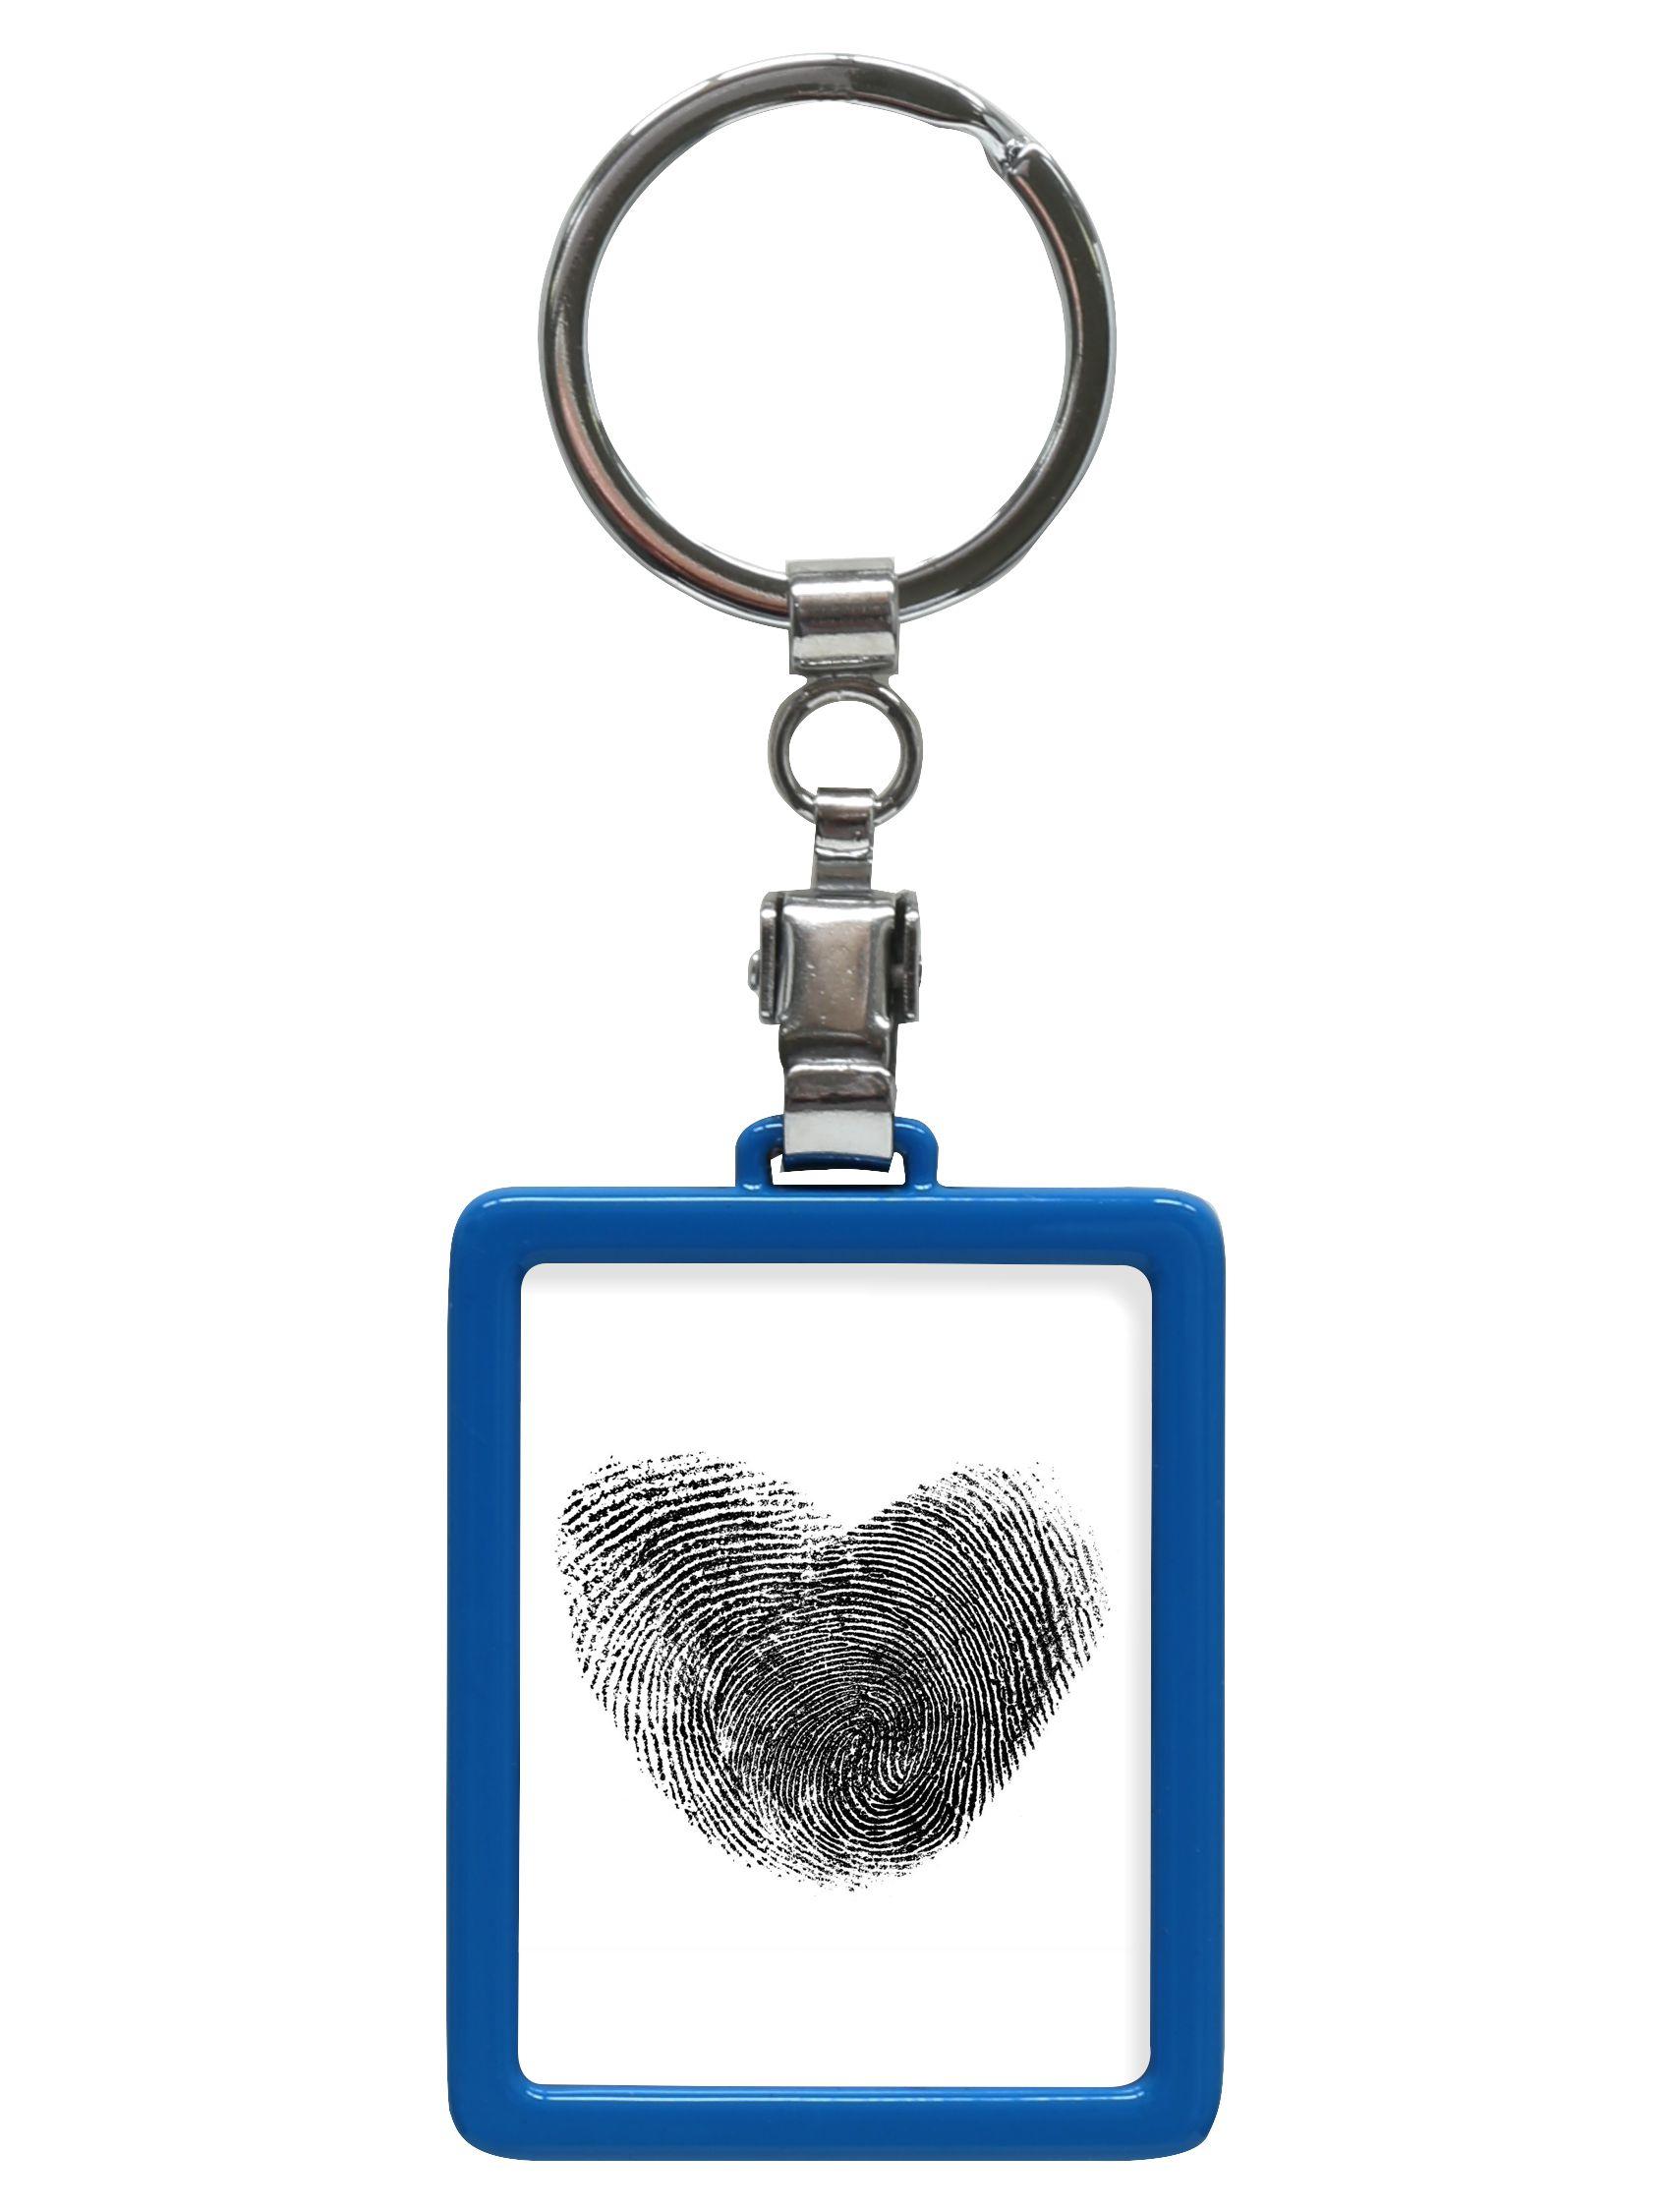 sleutelhanger blauw, rechthoekig S59NK6